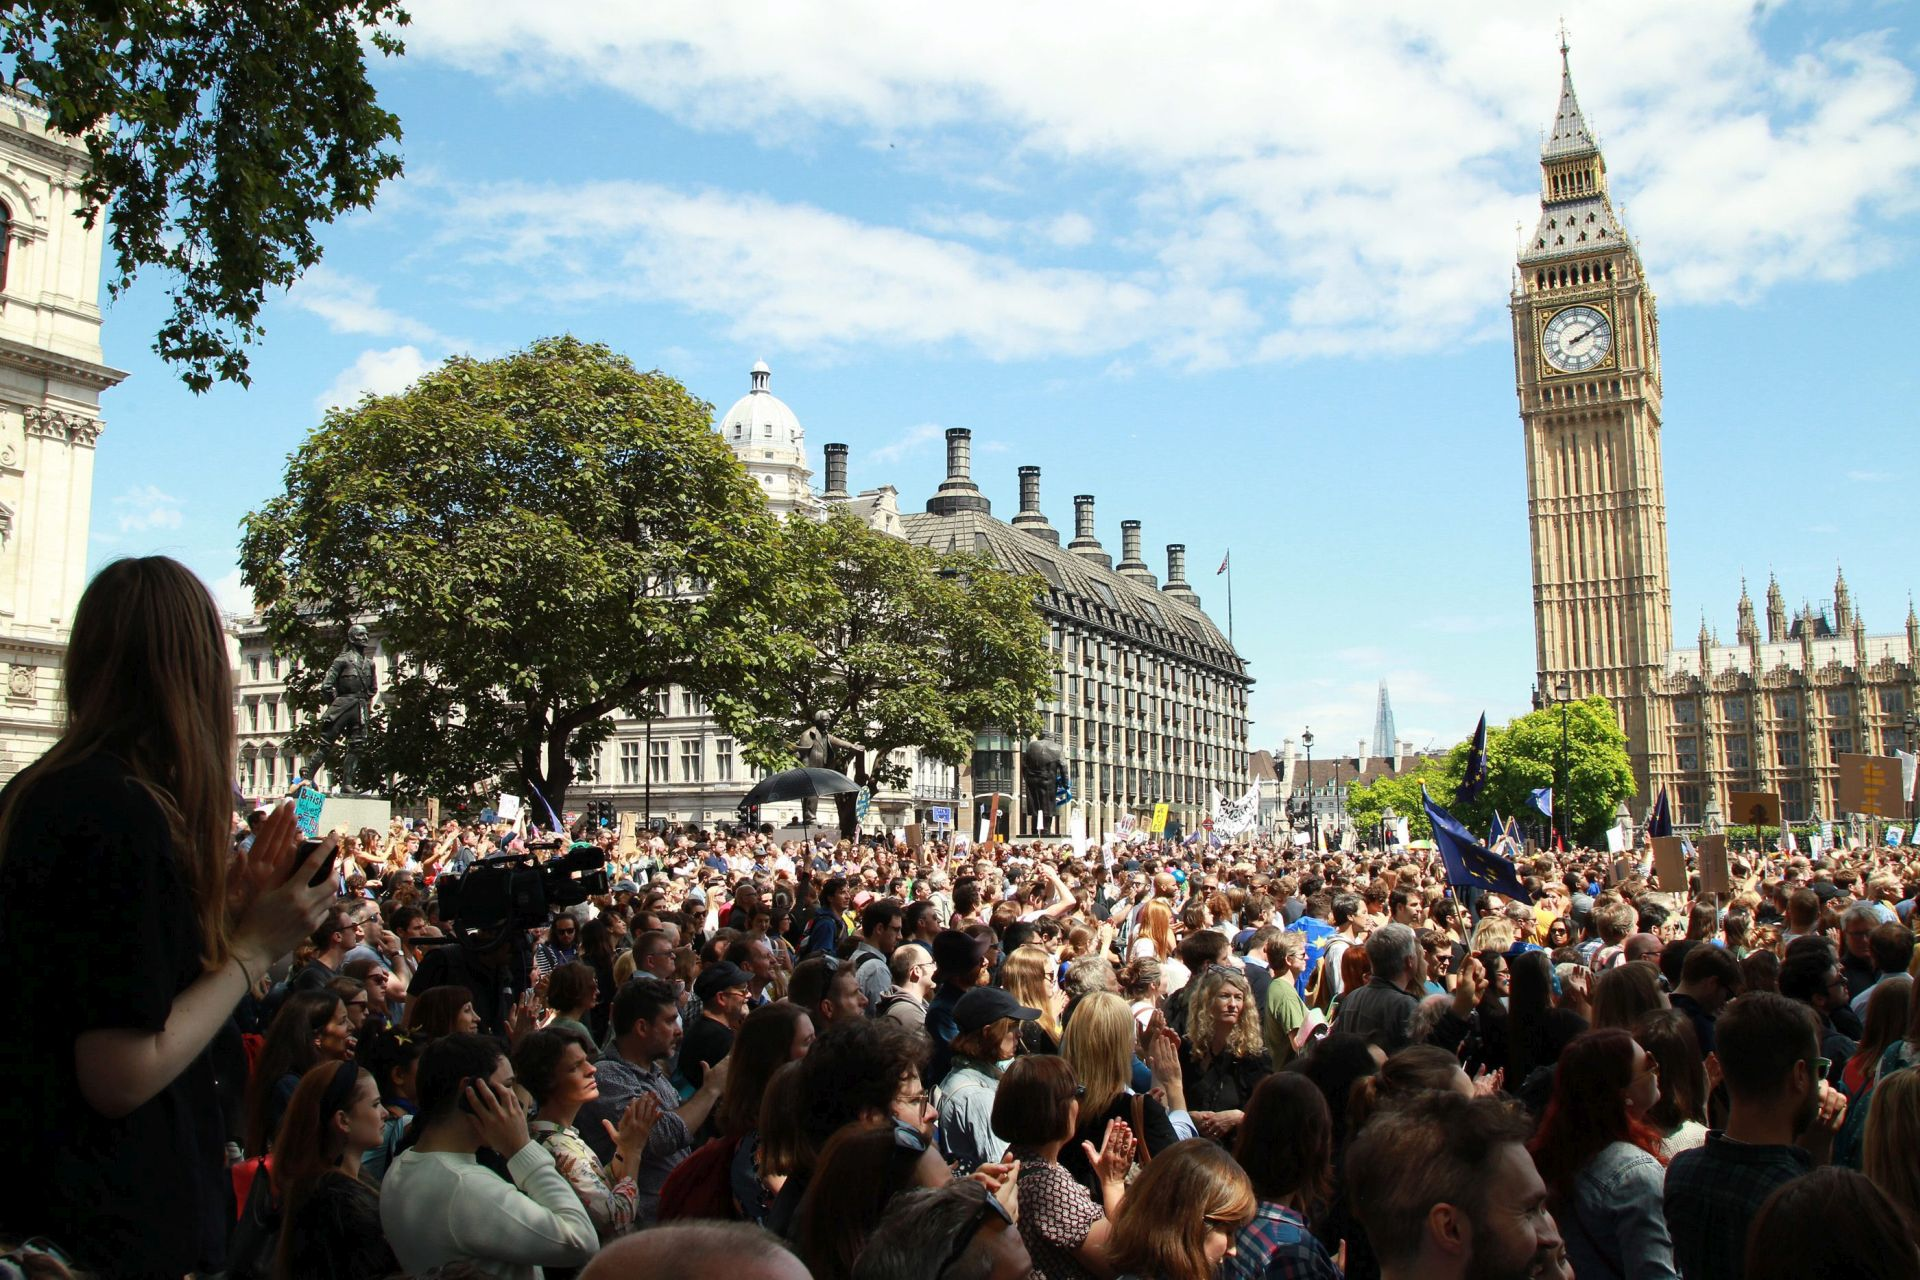 BREXIT: Britanski parlament razmotrit će peticiju za drugim referendumom